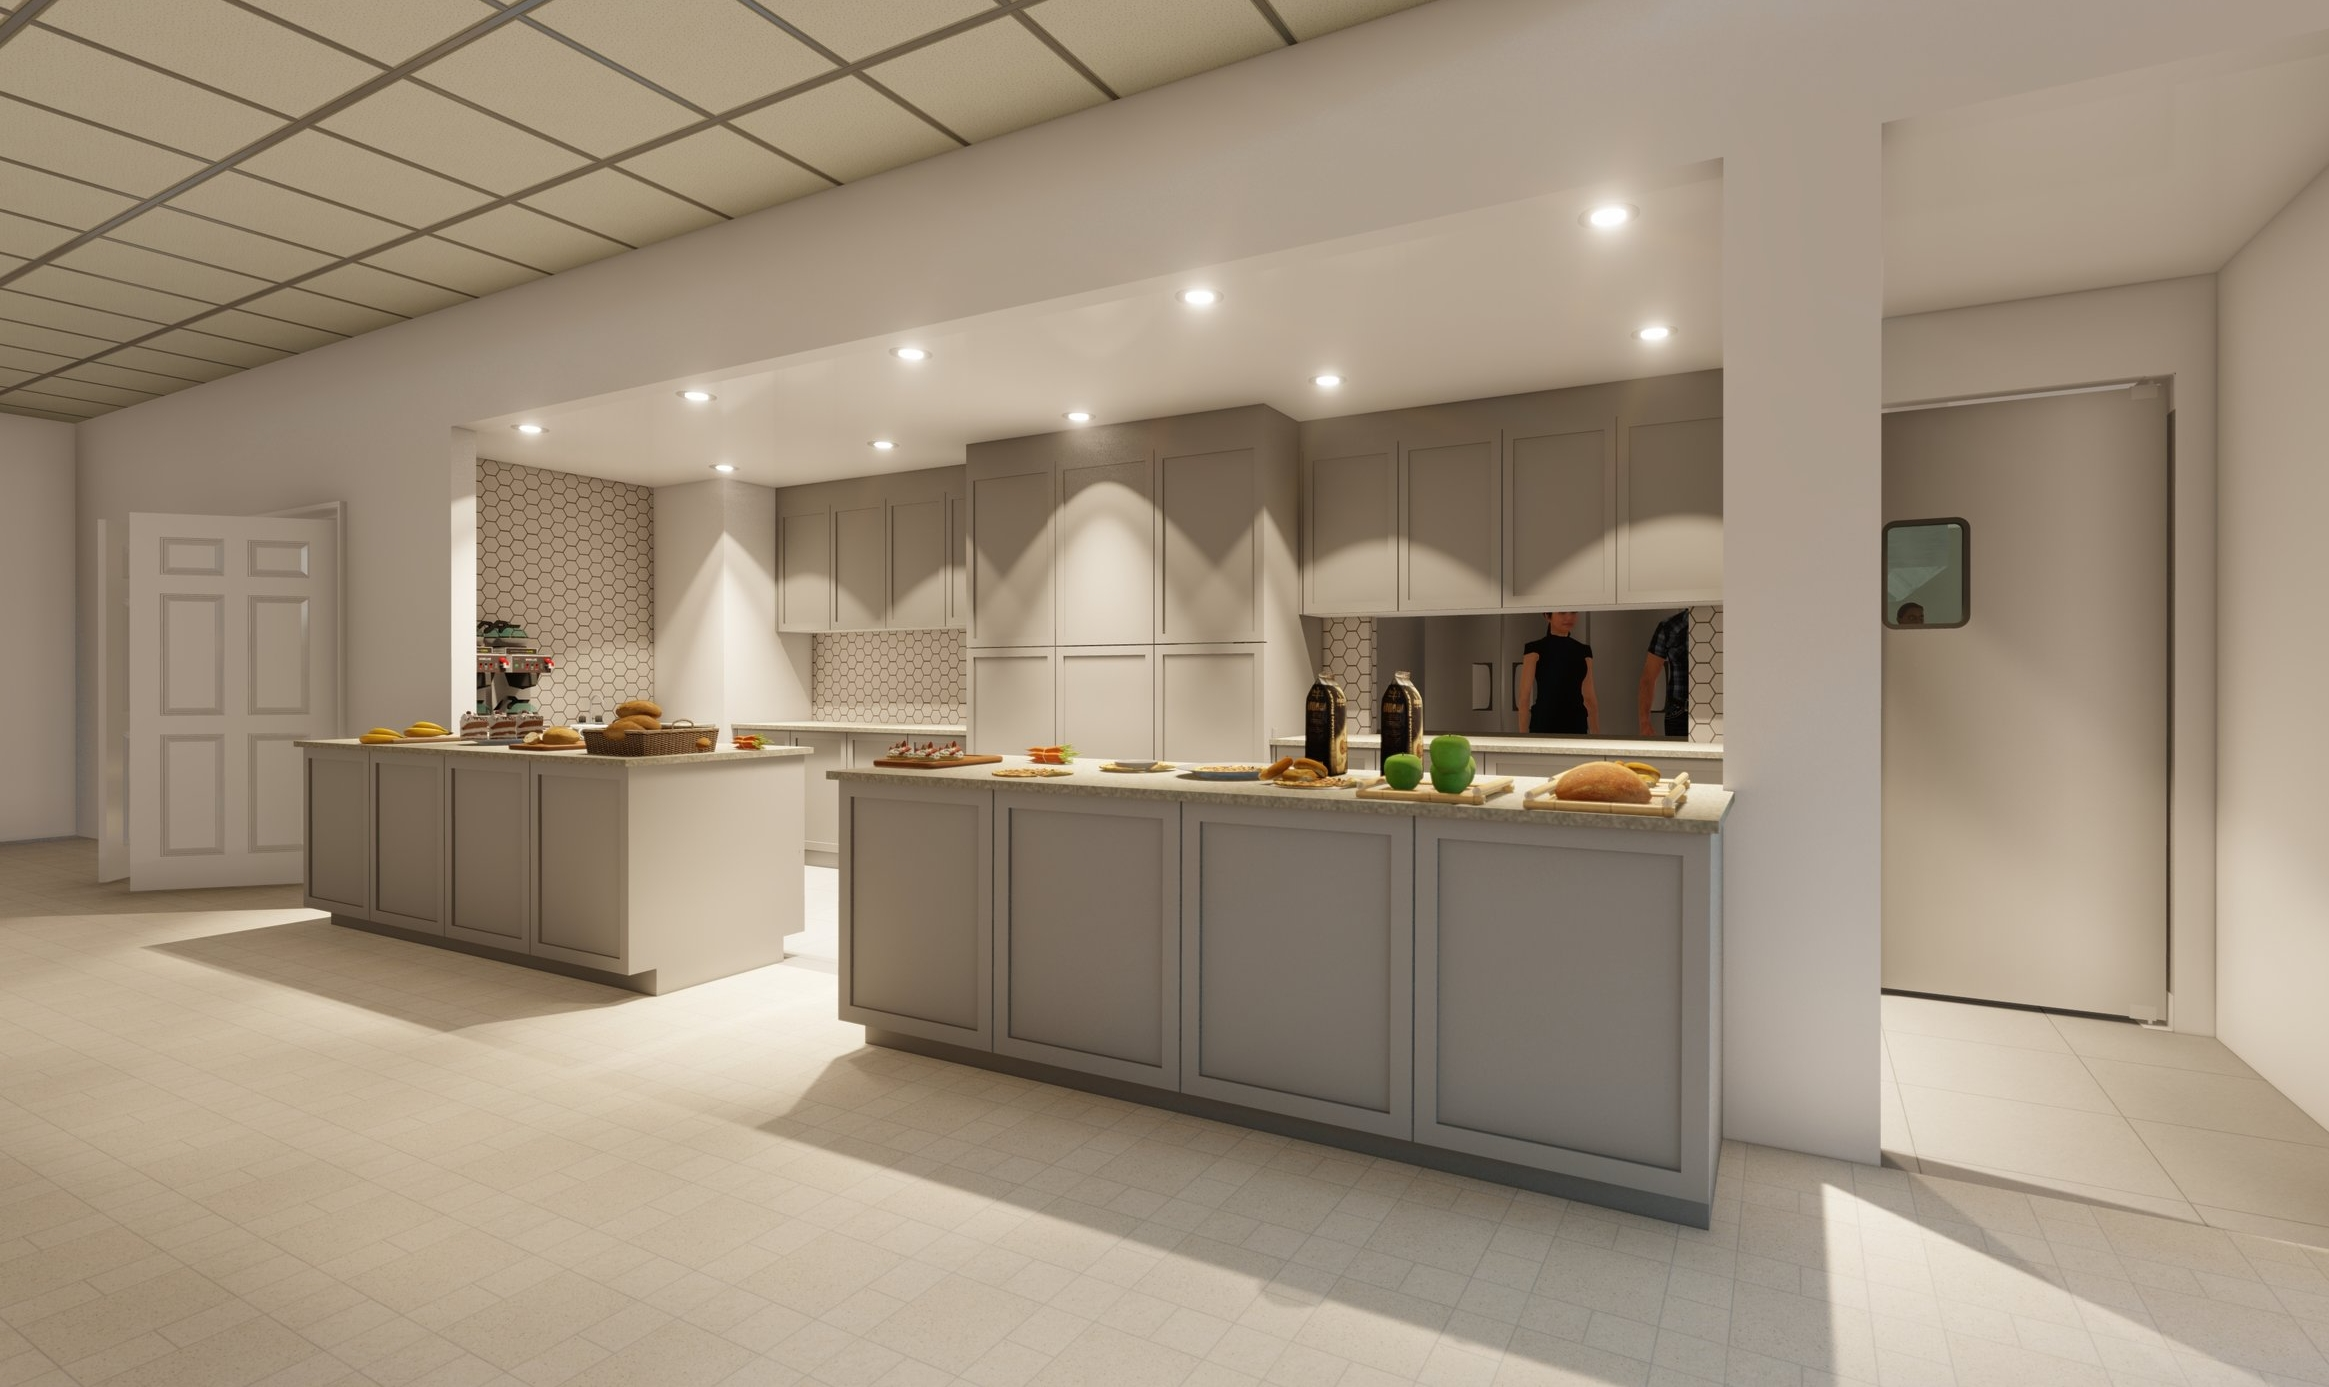 St. Marks By The Sea - Kitchen Renovation